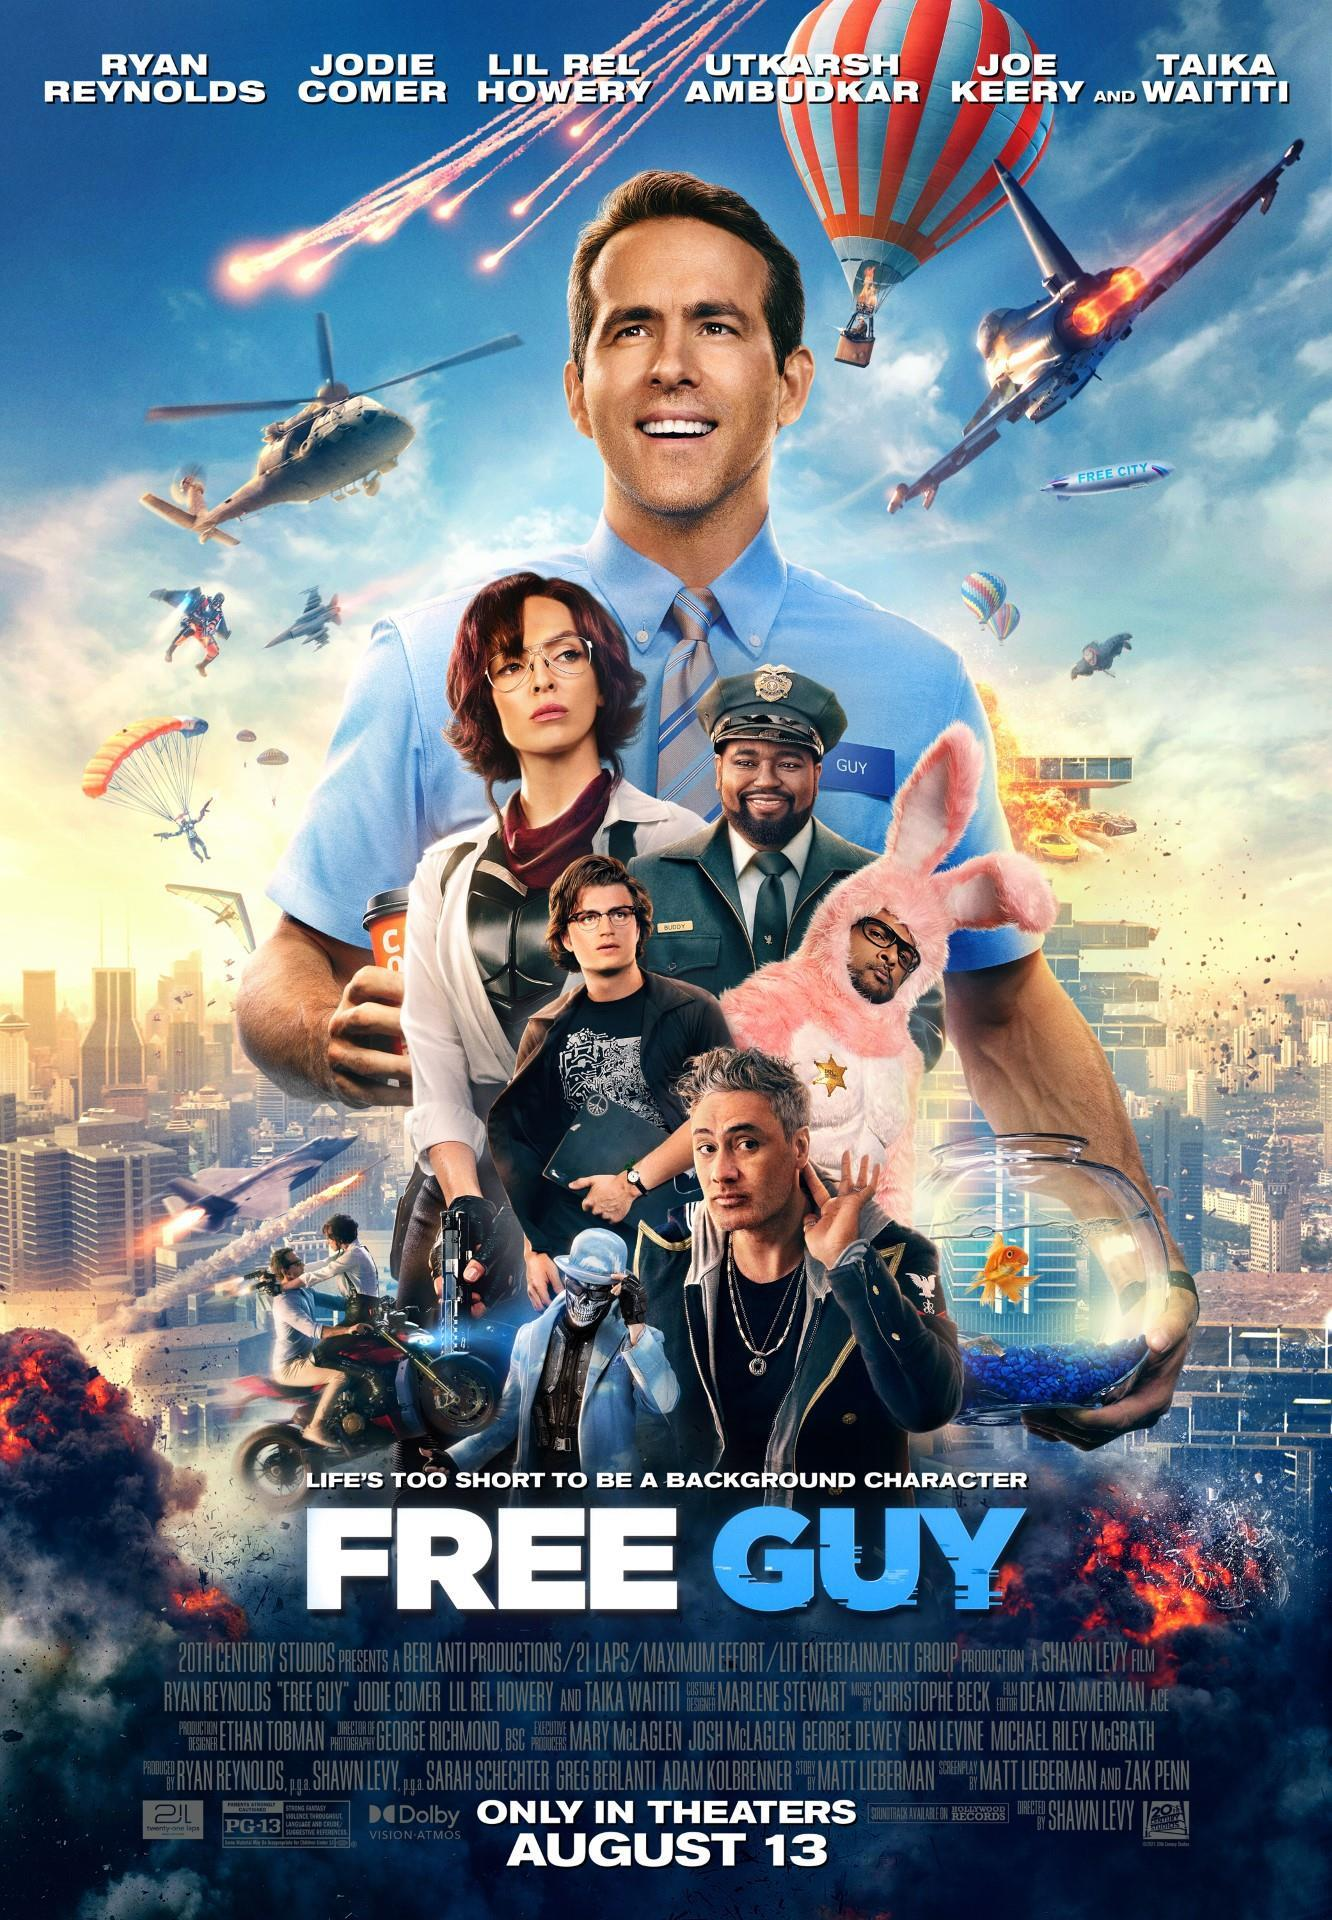 [Free Guy poster]